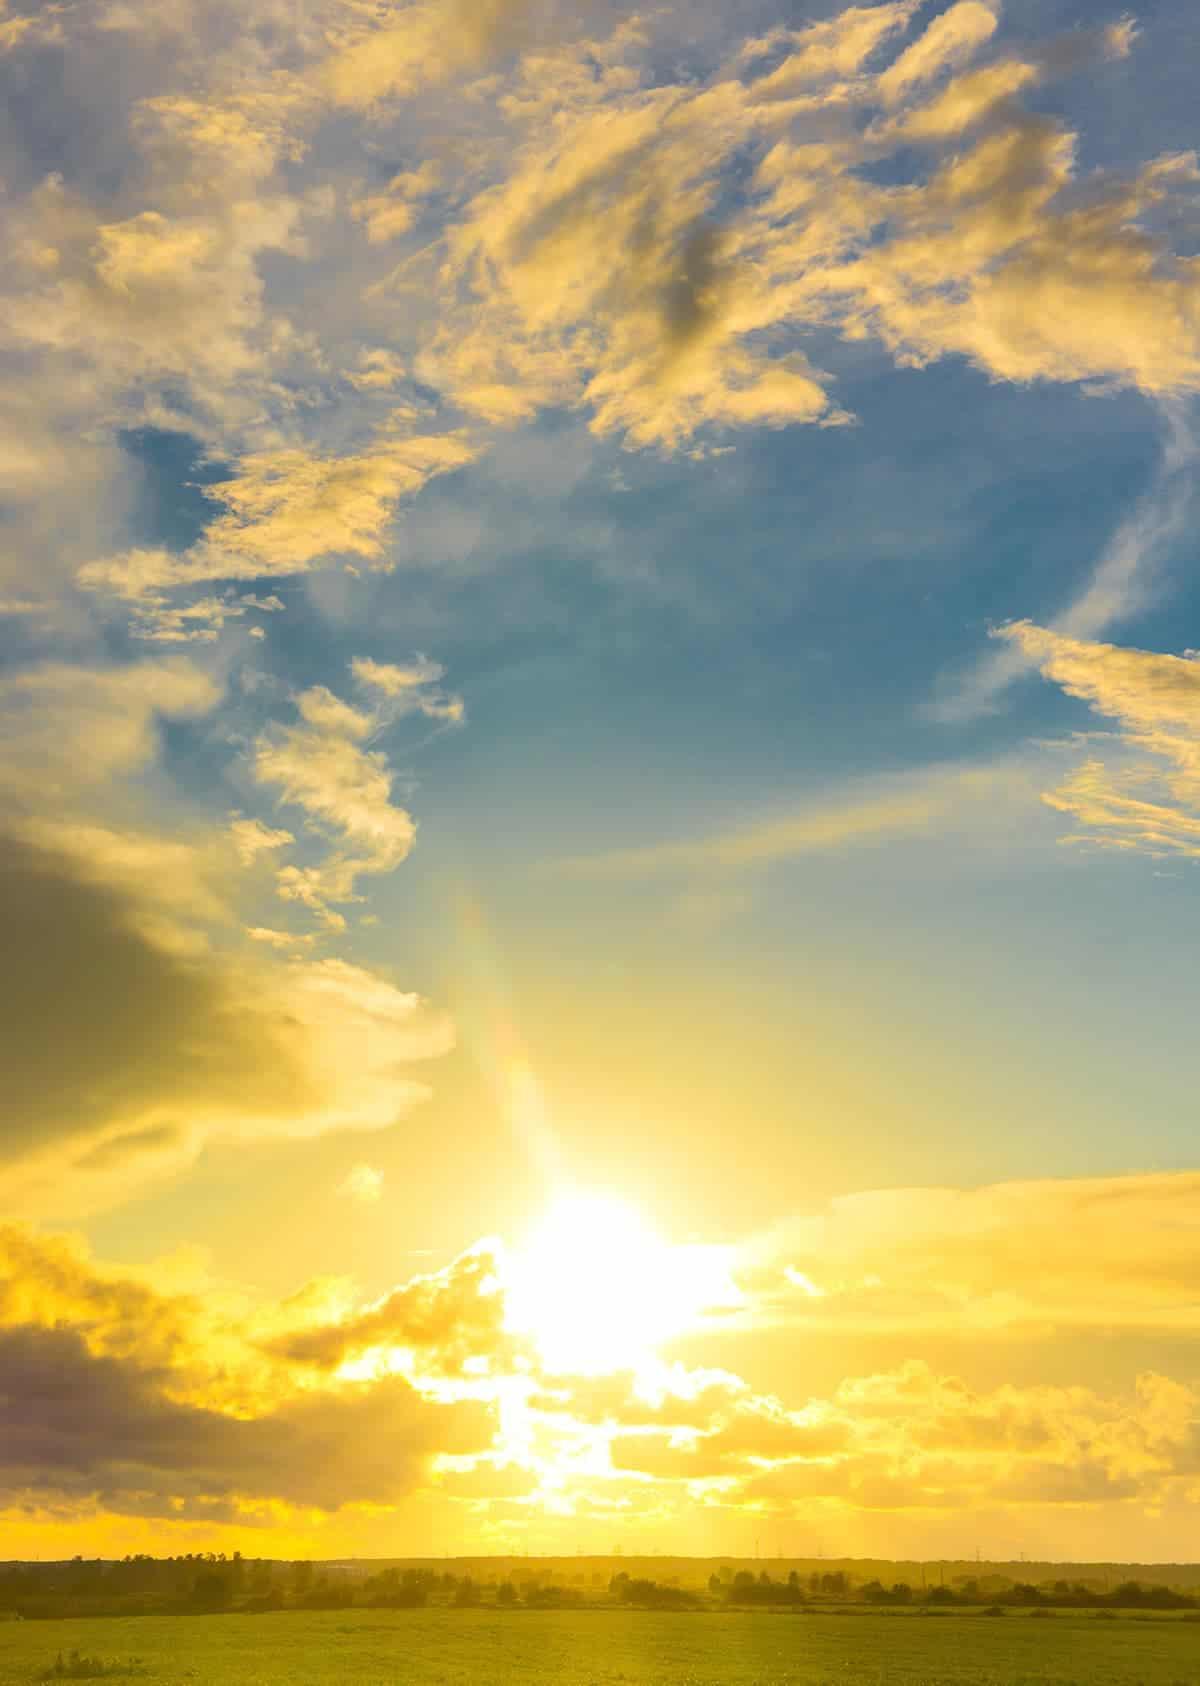 A sun rises over a field.